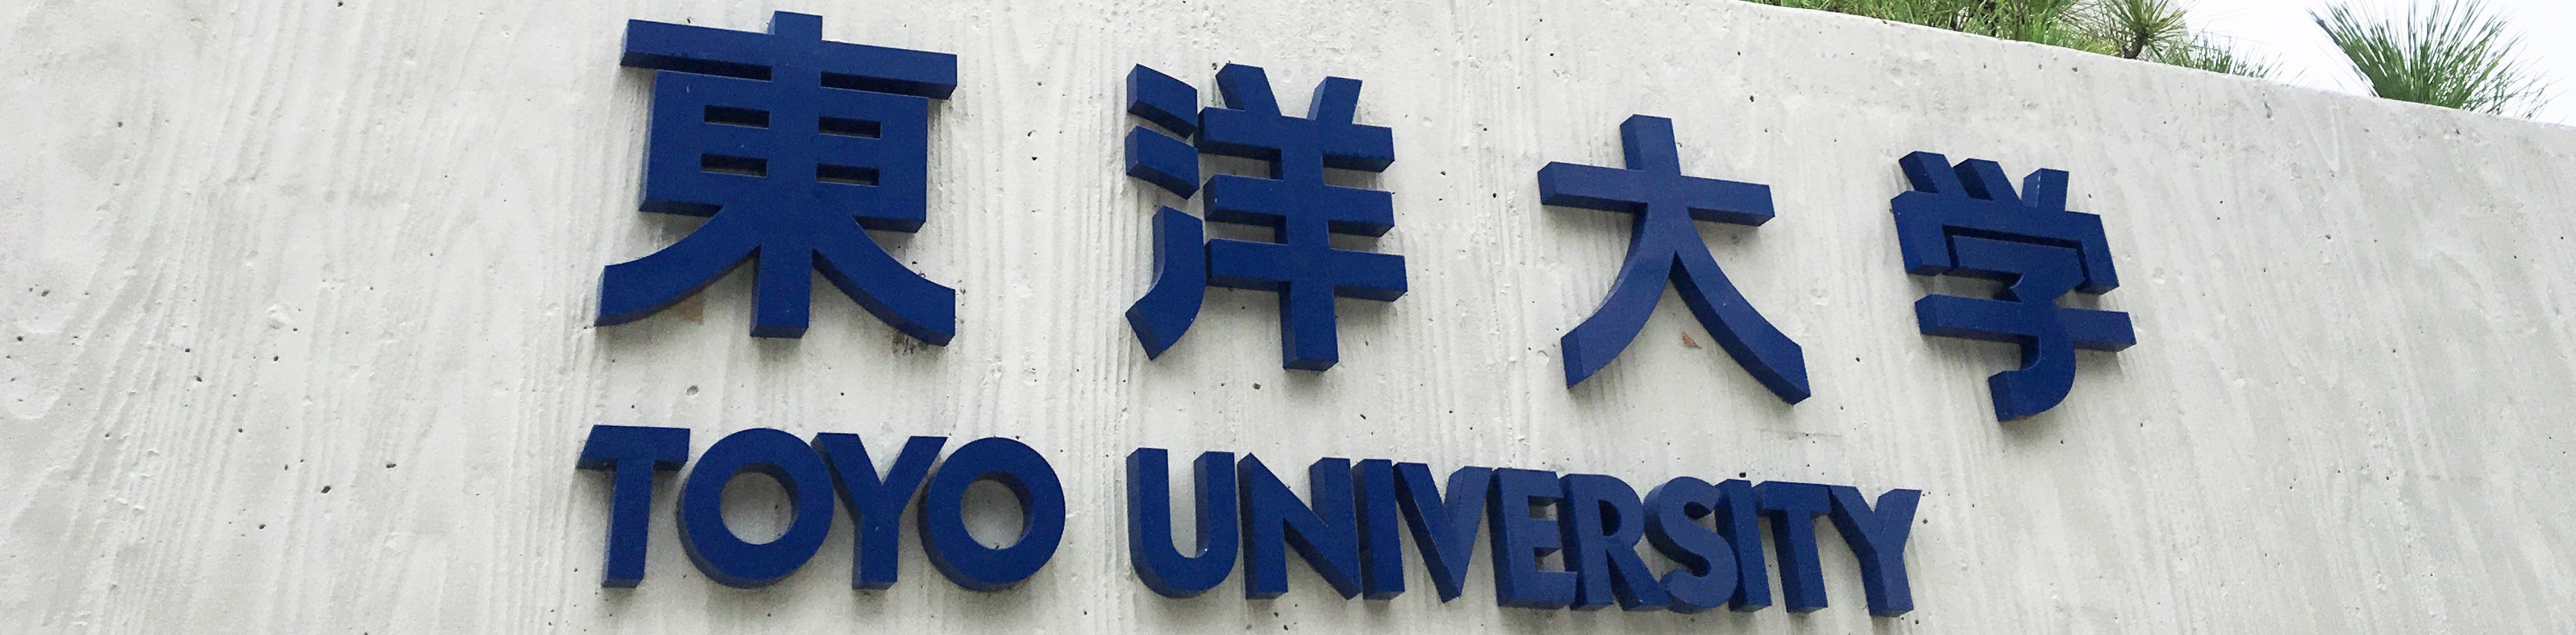 Toyo University hero image